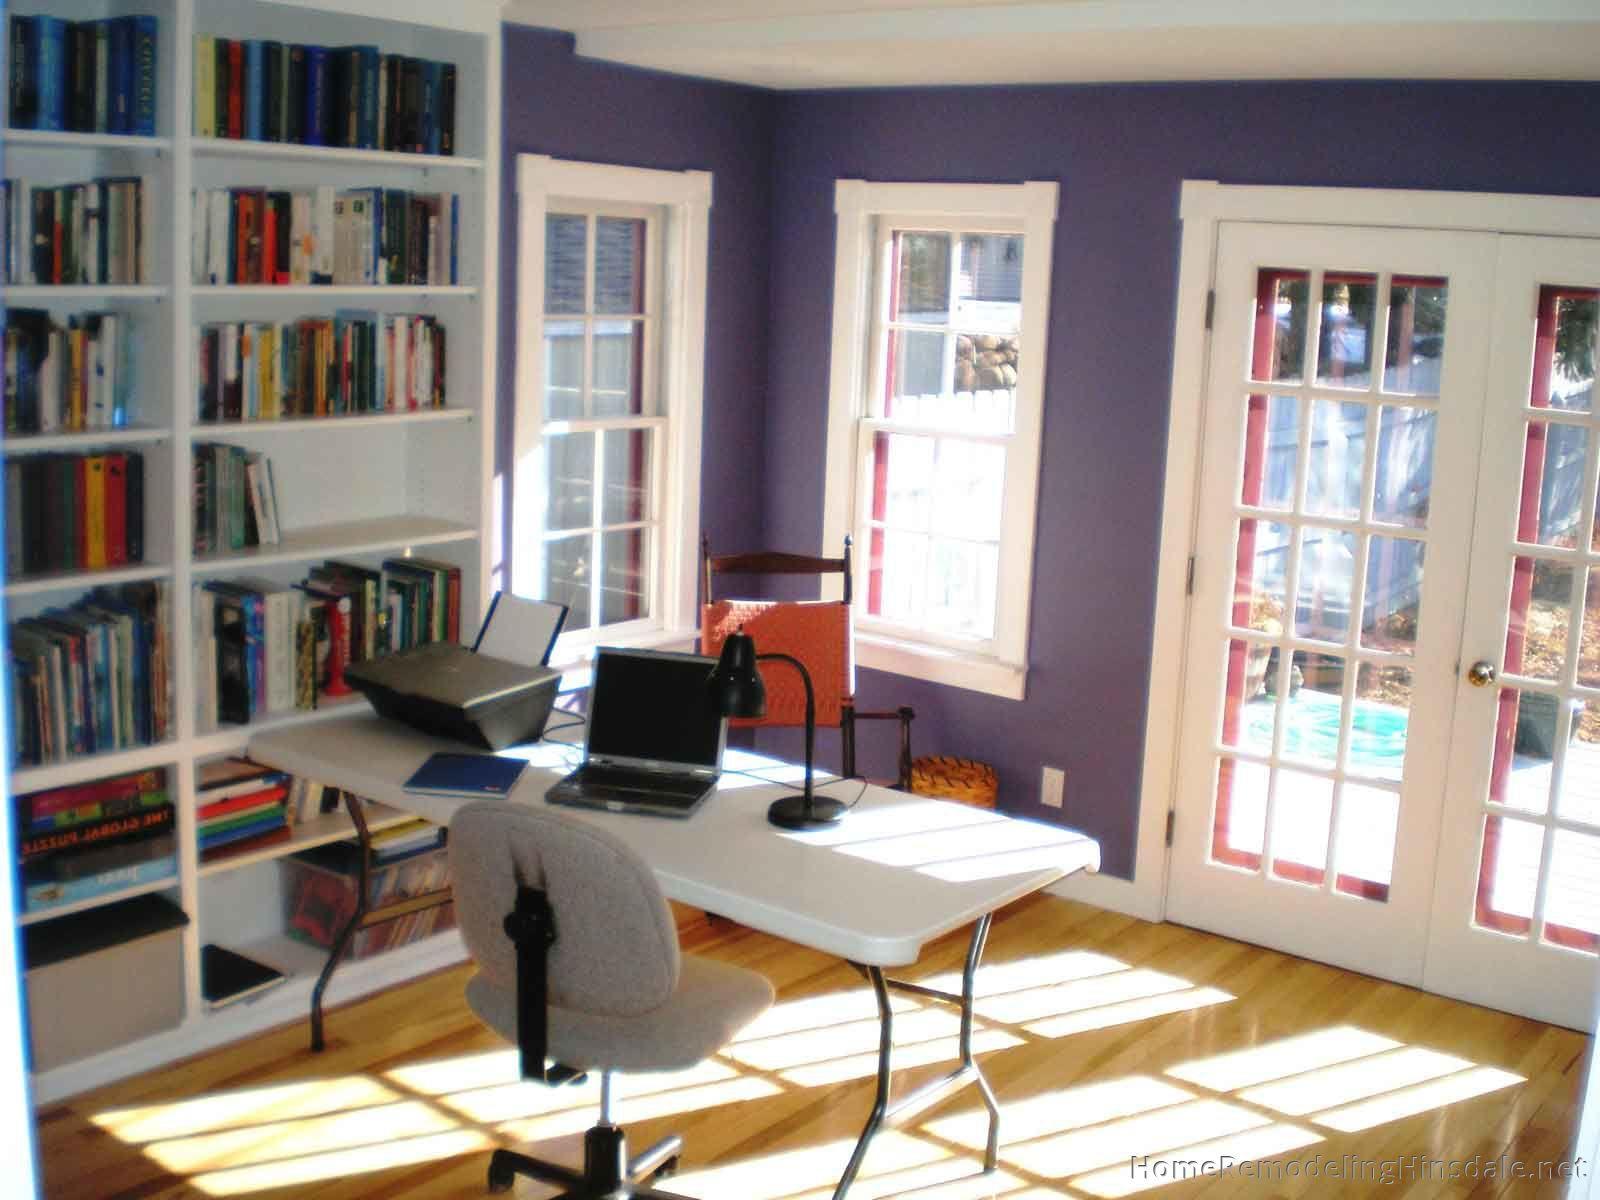 Small Space Office Bedroom Desk Deskjpg Sofa Bed Deskjpg Home Ofice Design Your Home